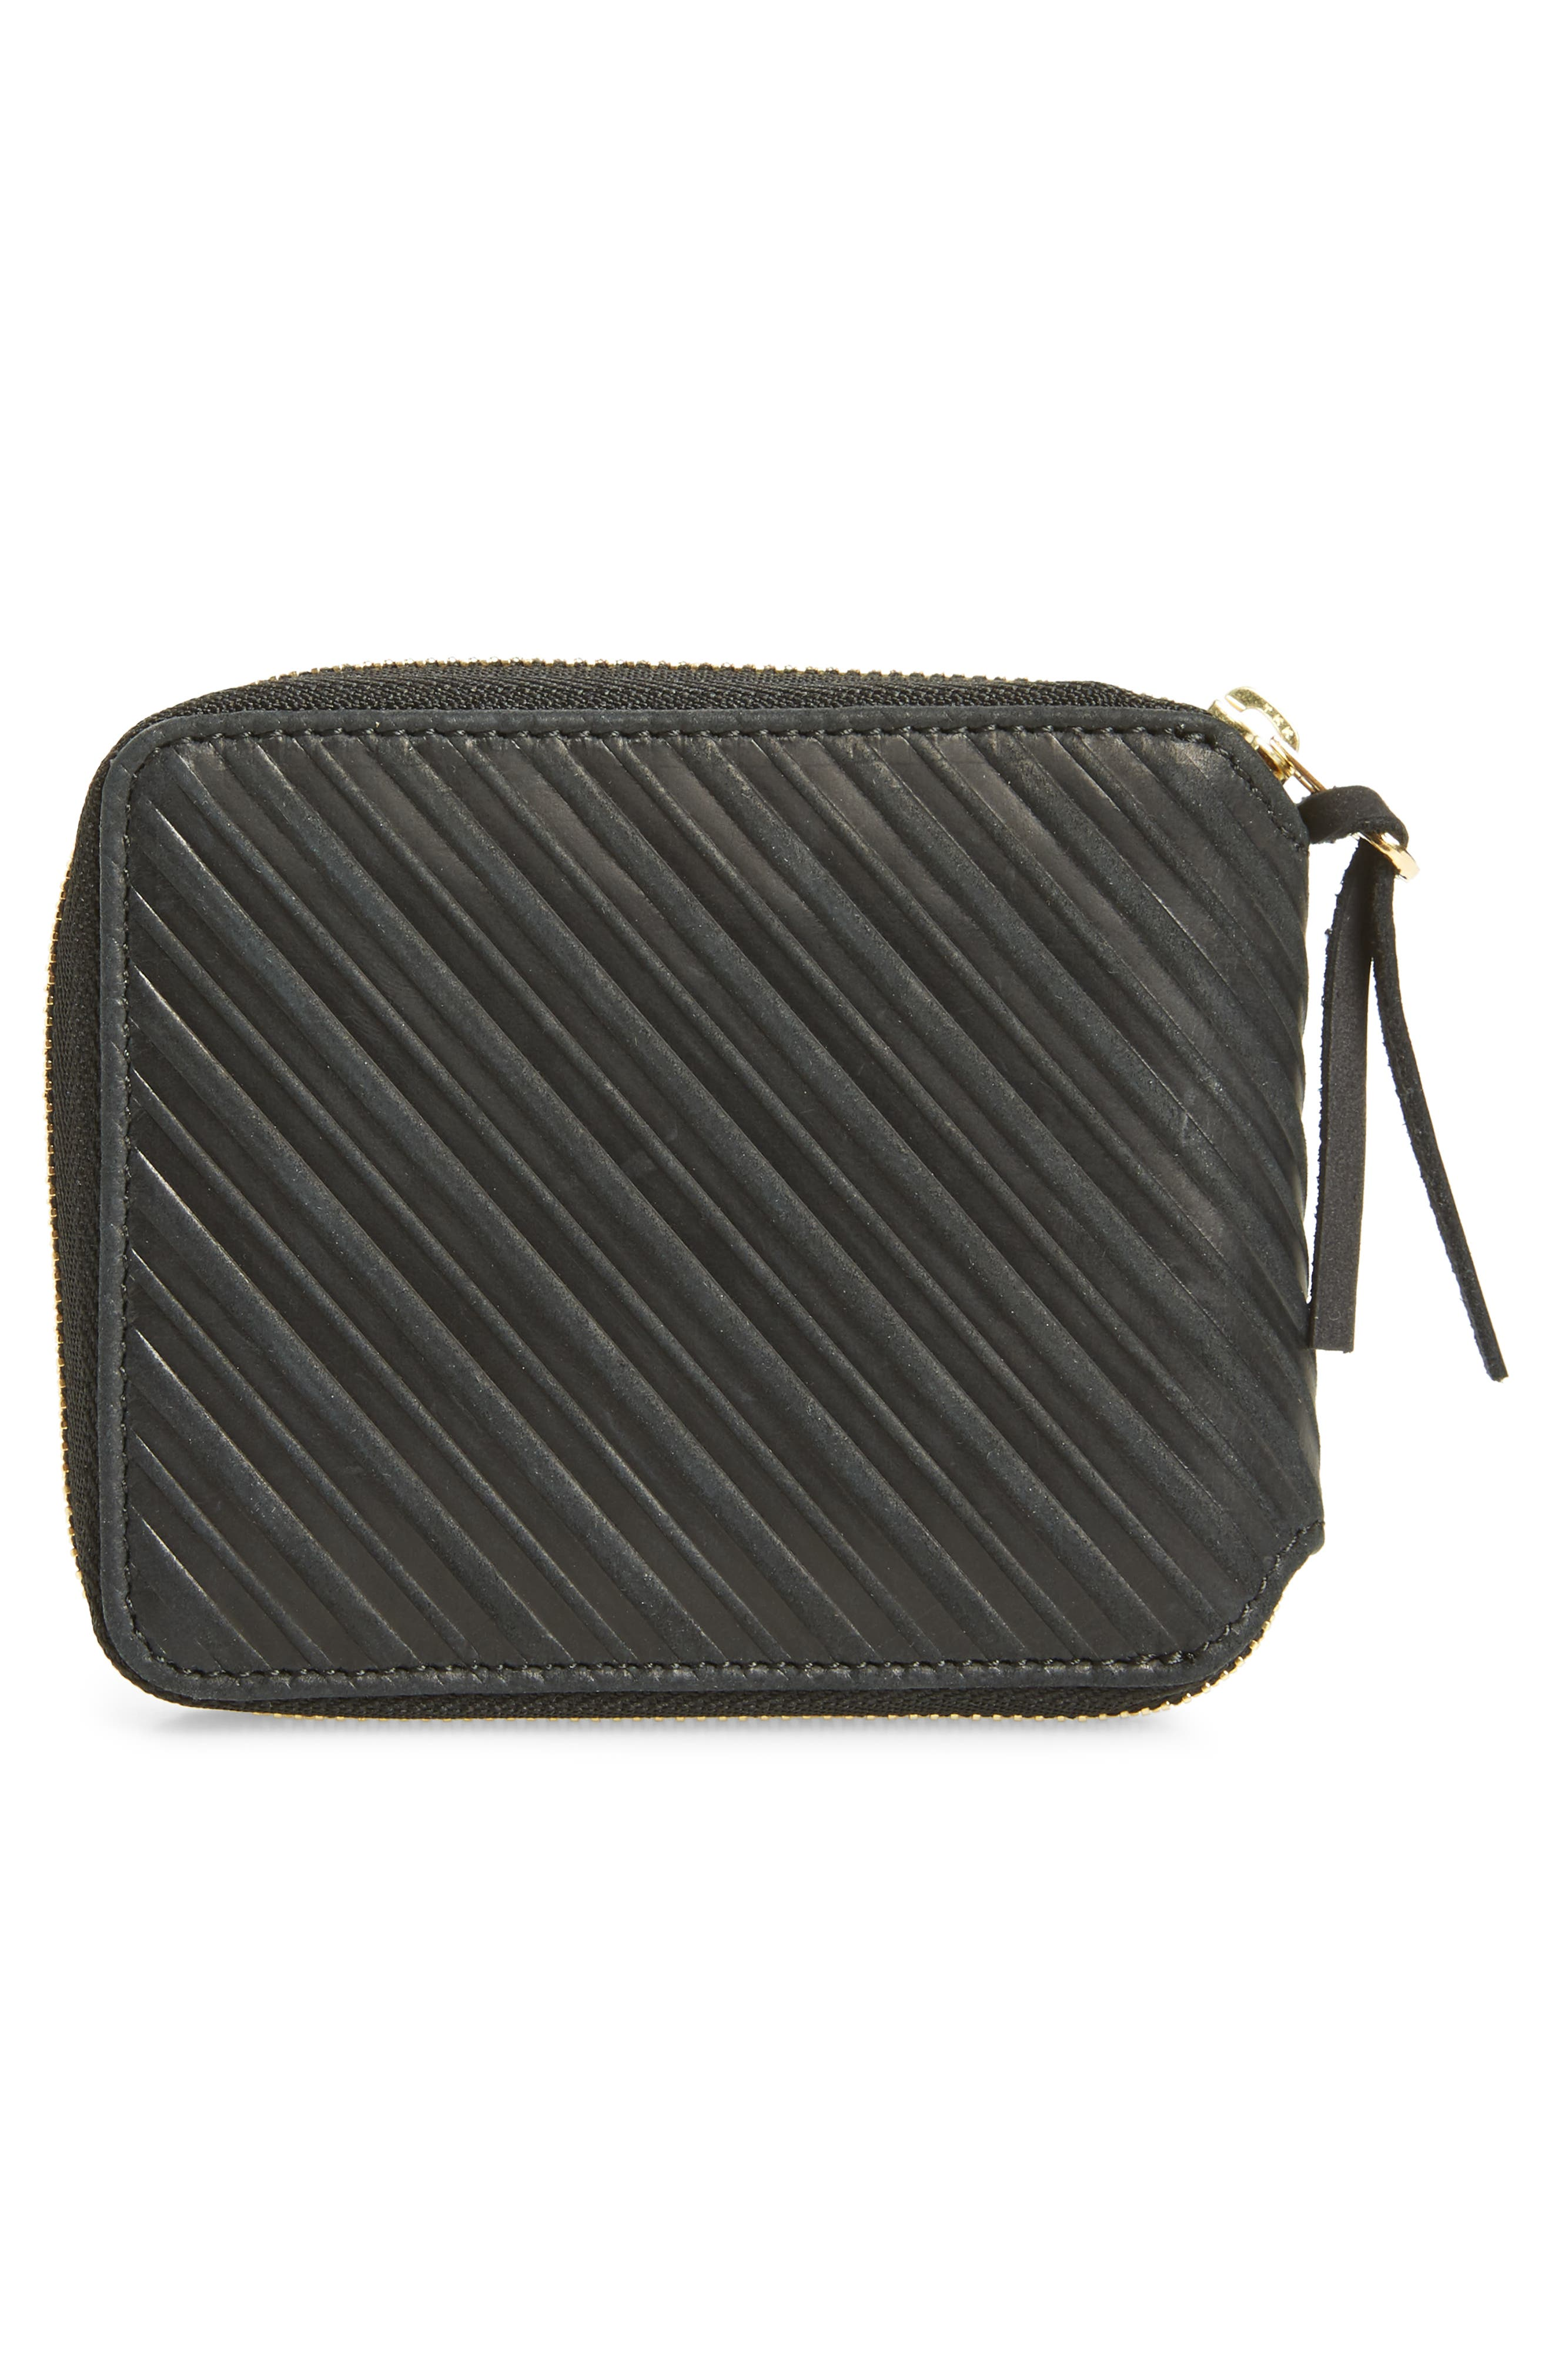 Leather Zip Wallet,                             Alternate thumbnail 3, color,                             Black